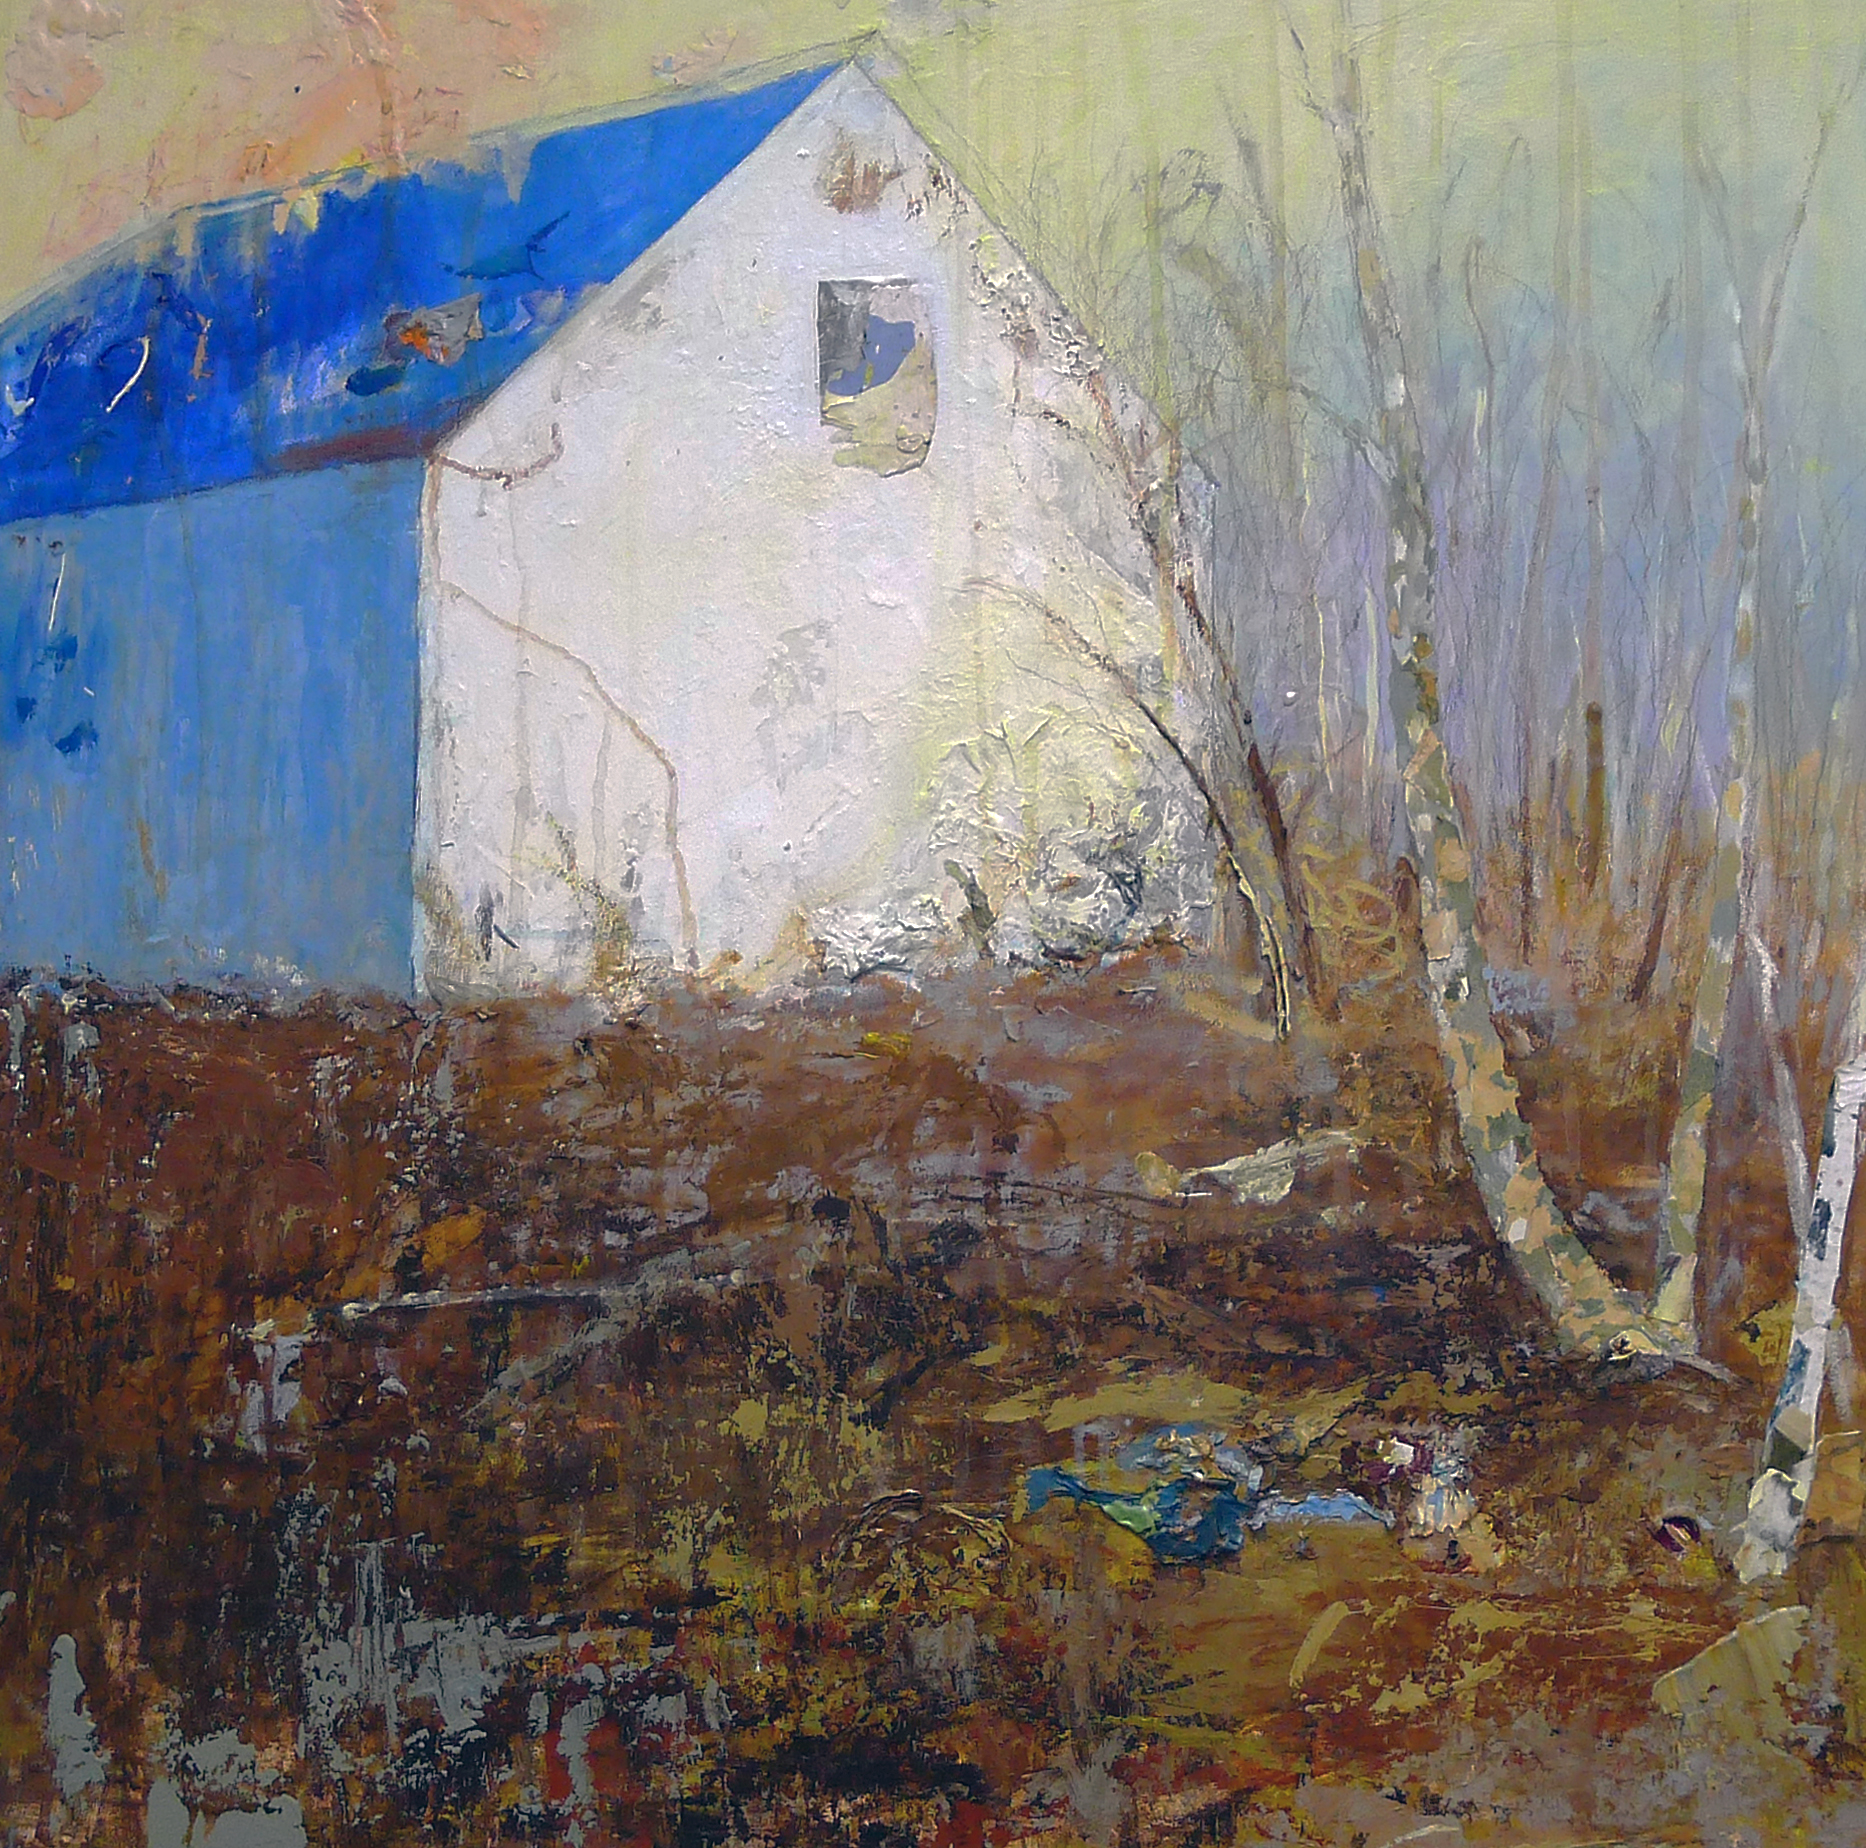 Blue Roof II,  painting by Brenda Cirioni